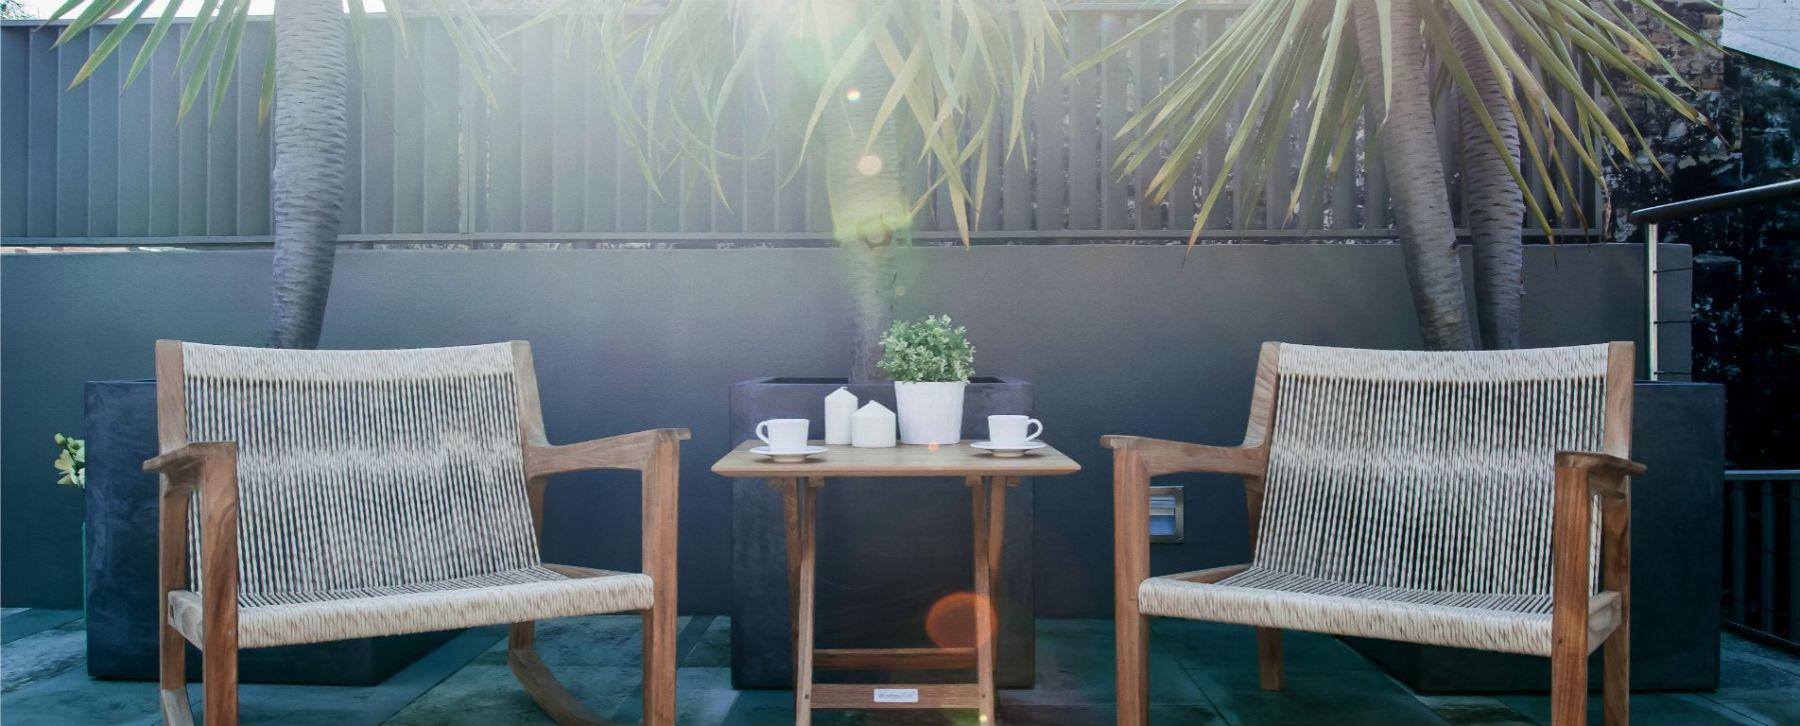 Avar Club Chairs Rocker Modern Teak Rope Pool Furniture Miami